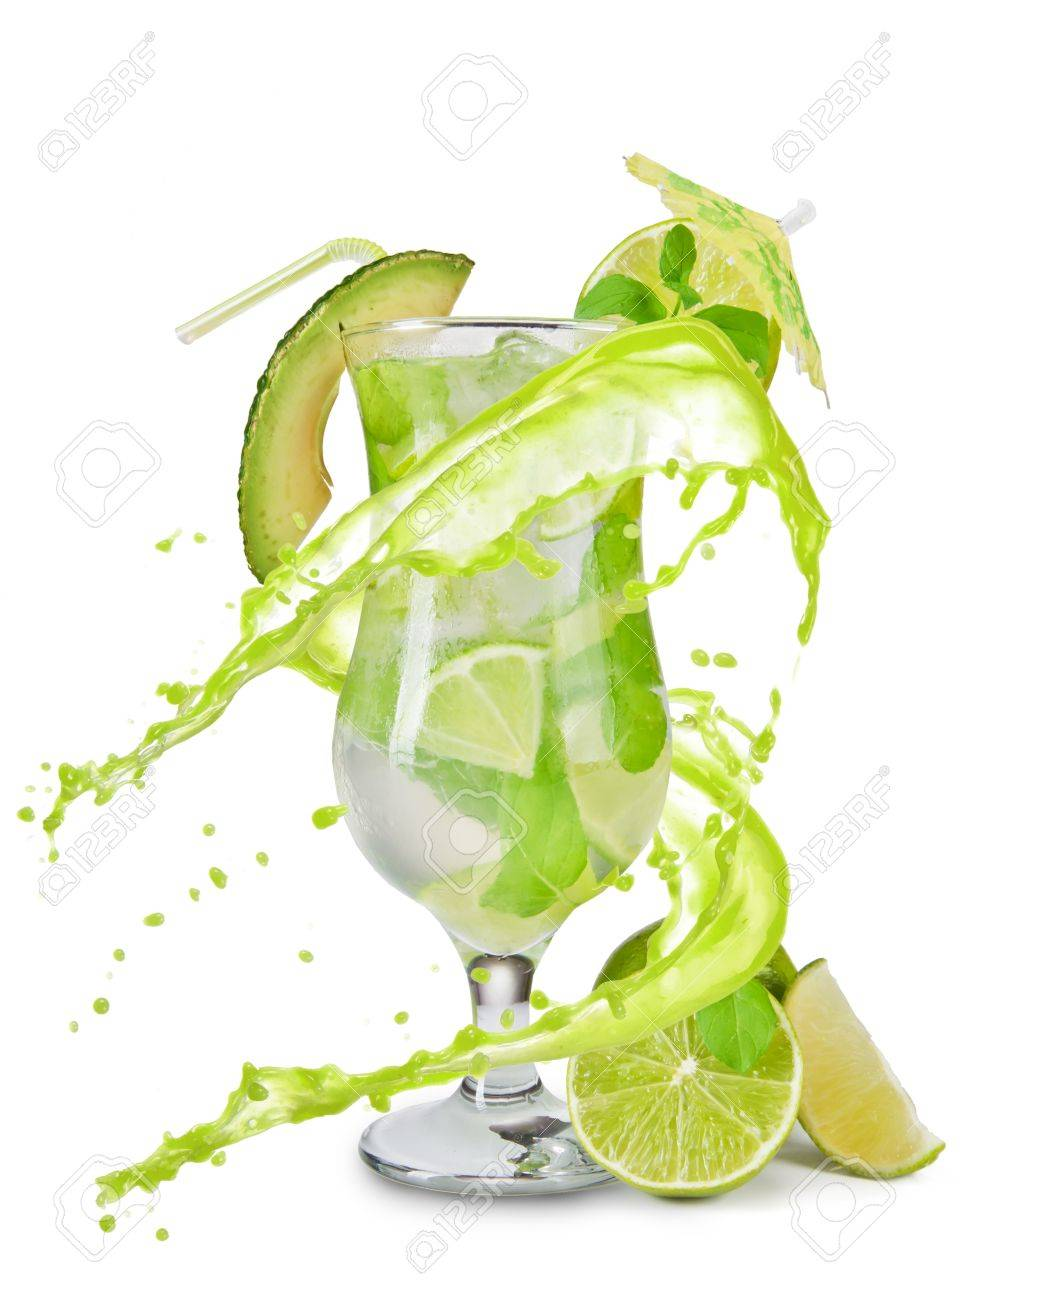 Mojito drink with splash, isolated on white background Stock Photo - 14078684